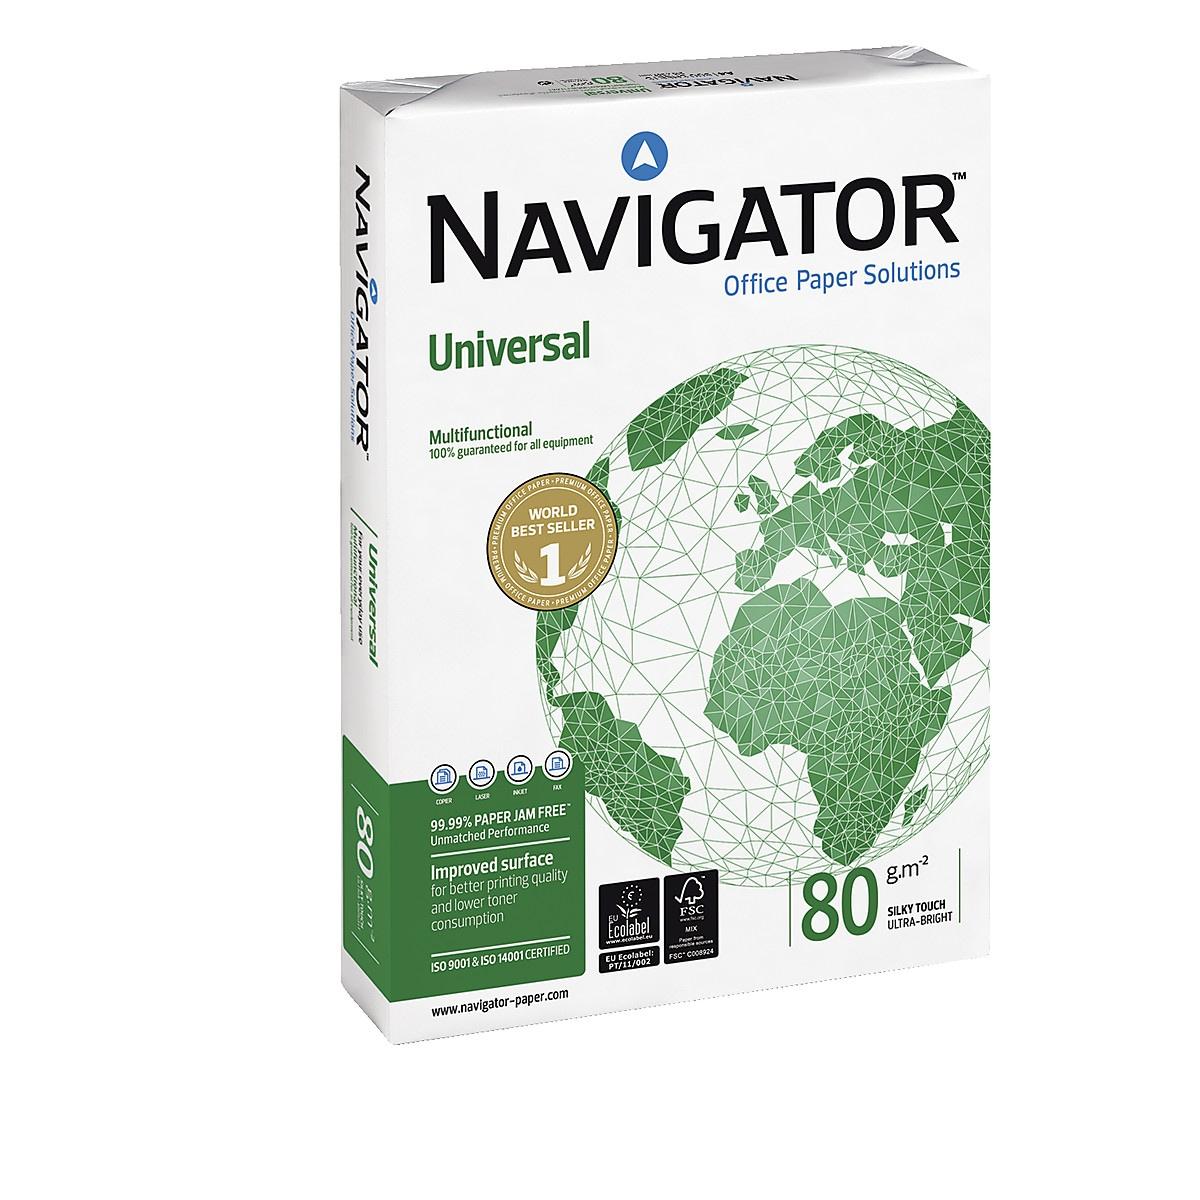 Navigator Universal 80 g/m² kopipapir